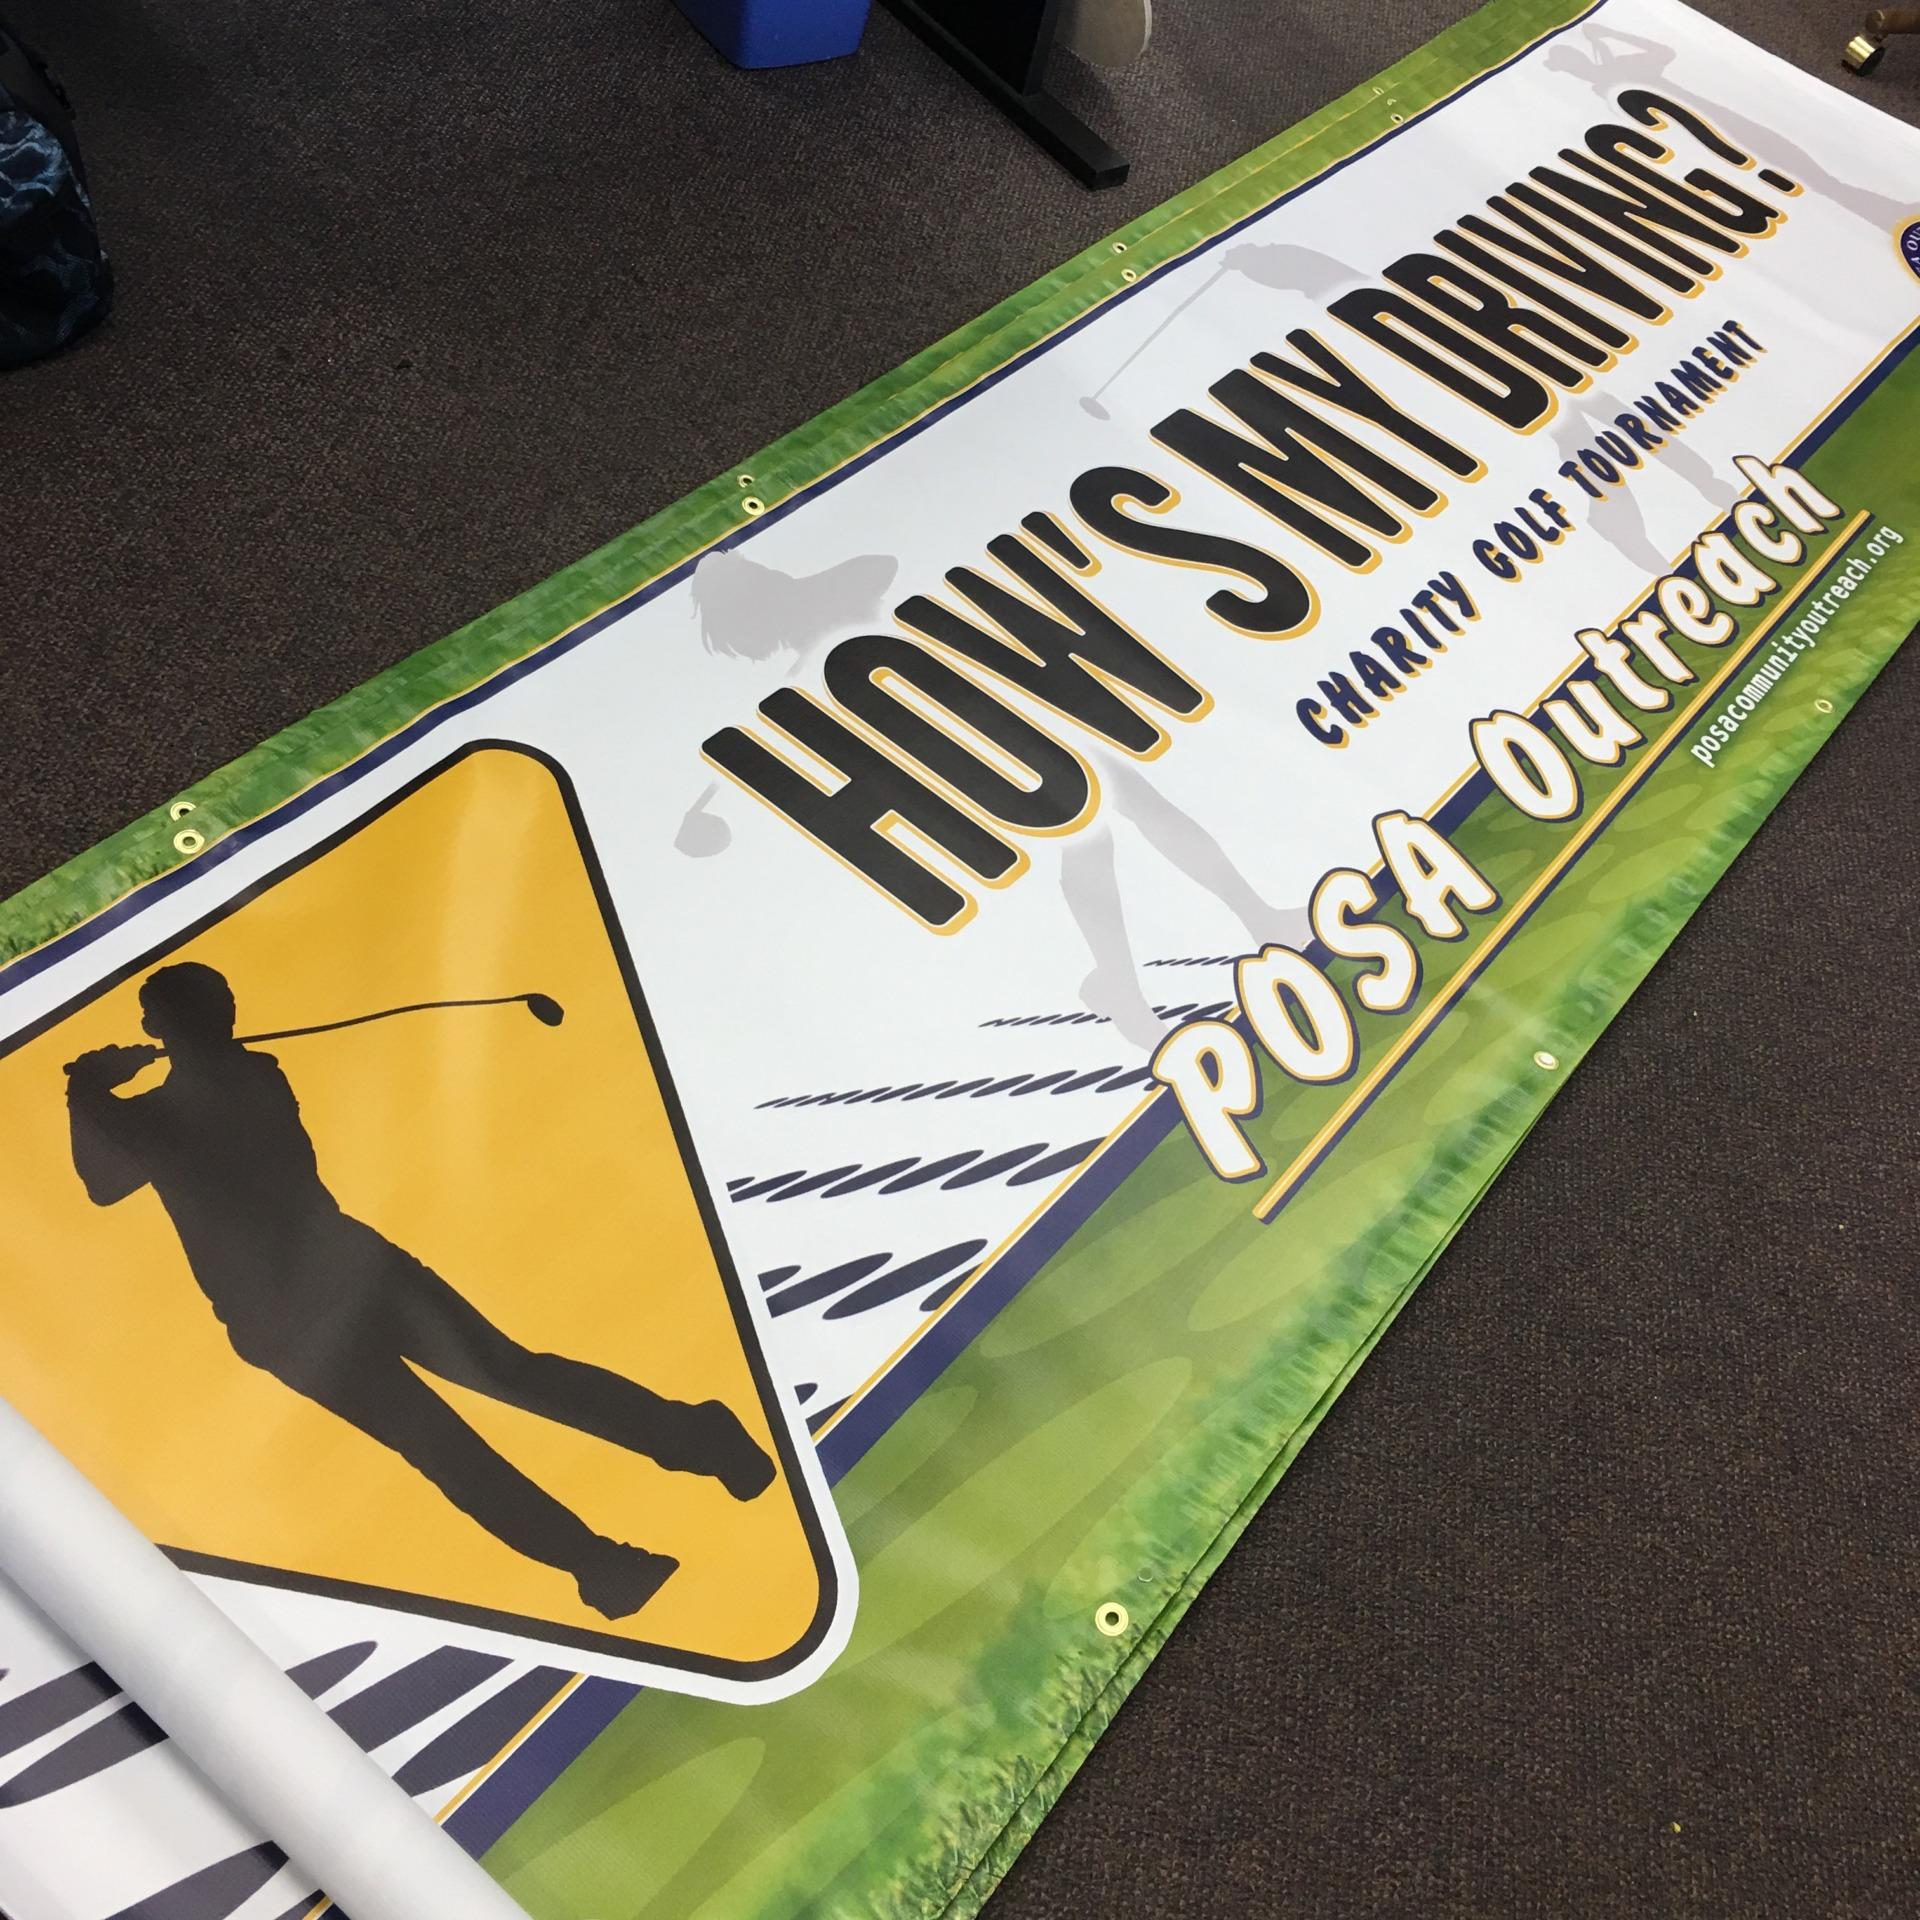 Large digital printed banner